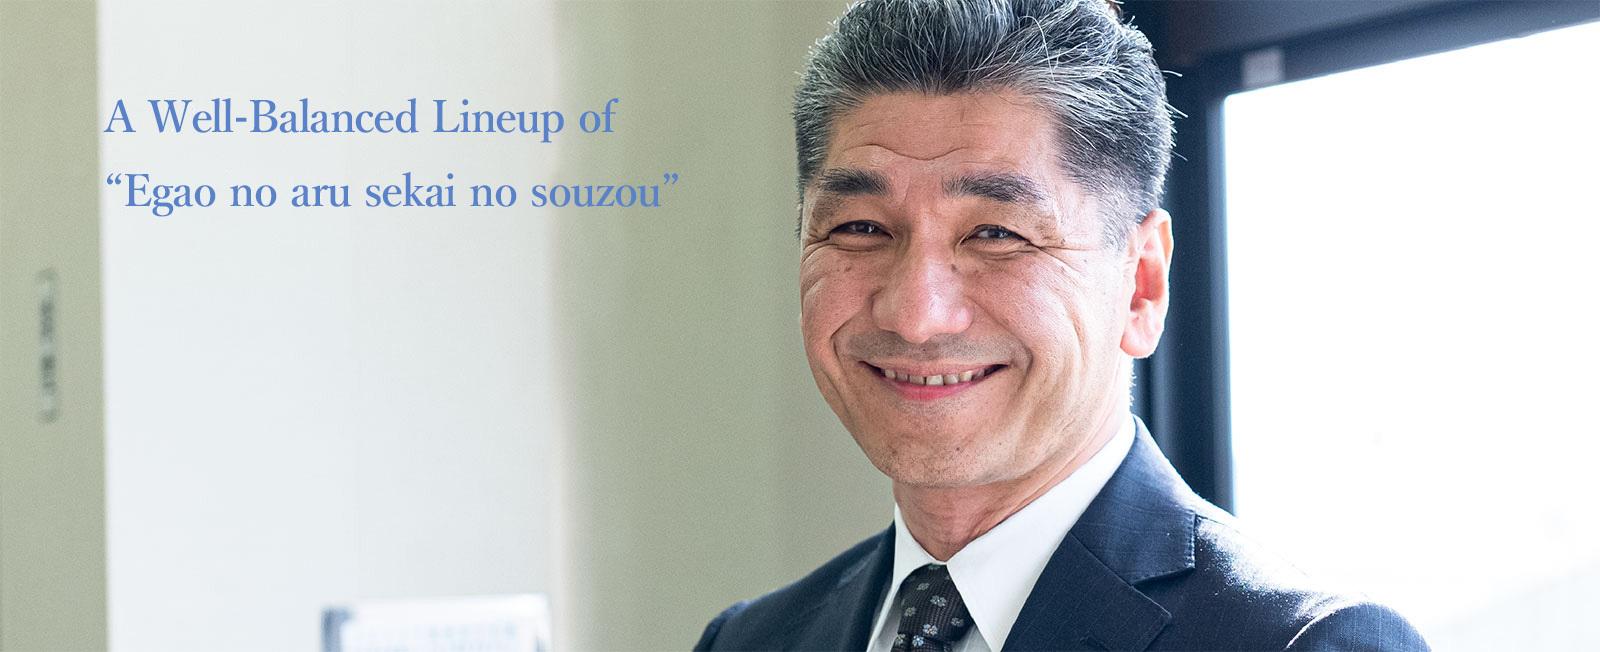 "A Well-Balanced Lineup of ""Egao no aru sekai no souzou"